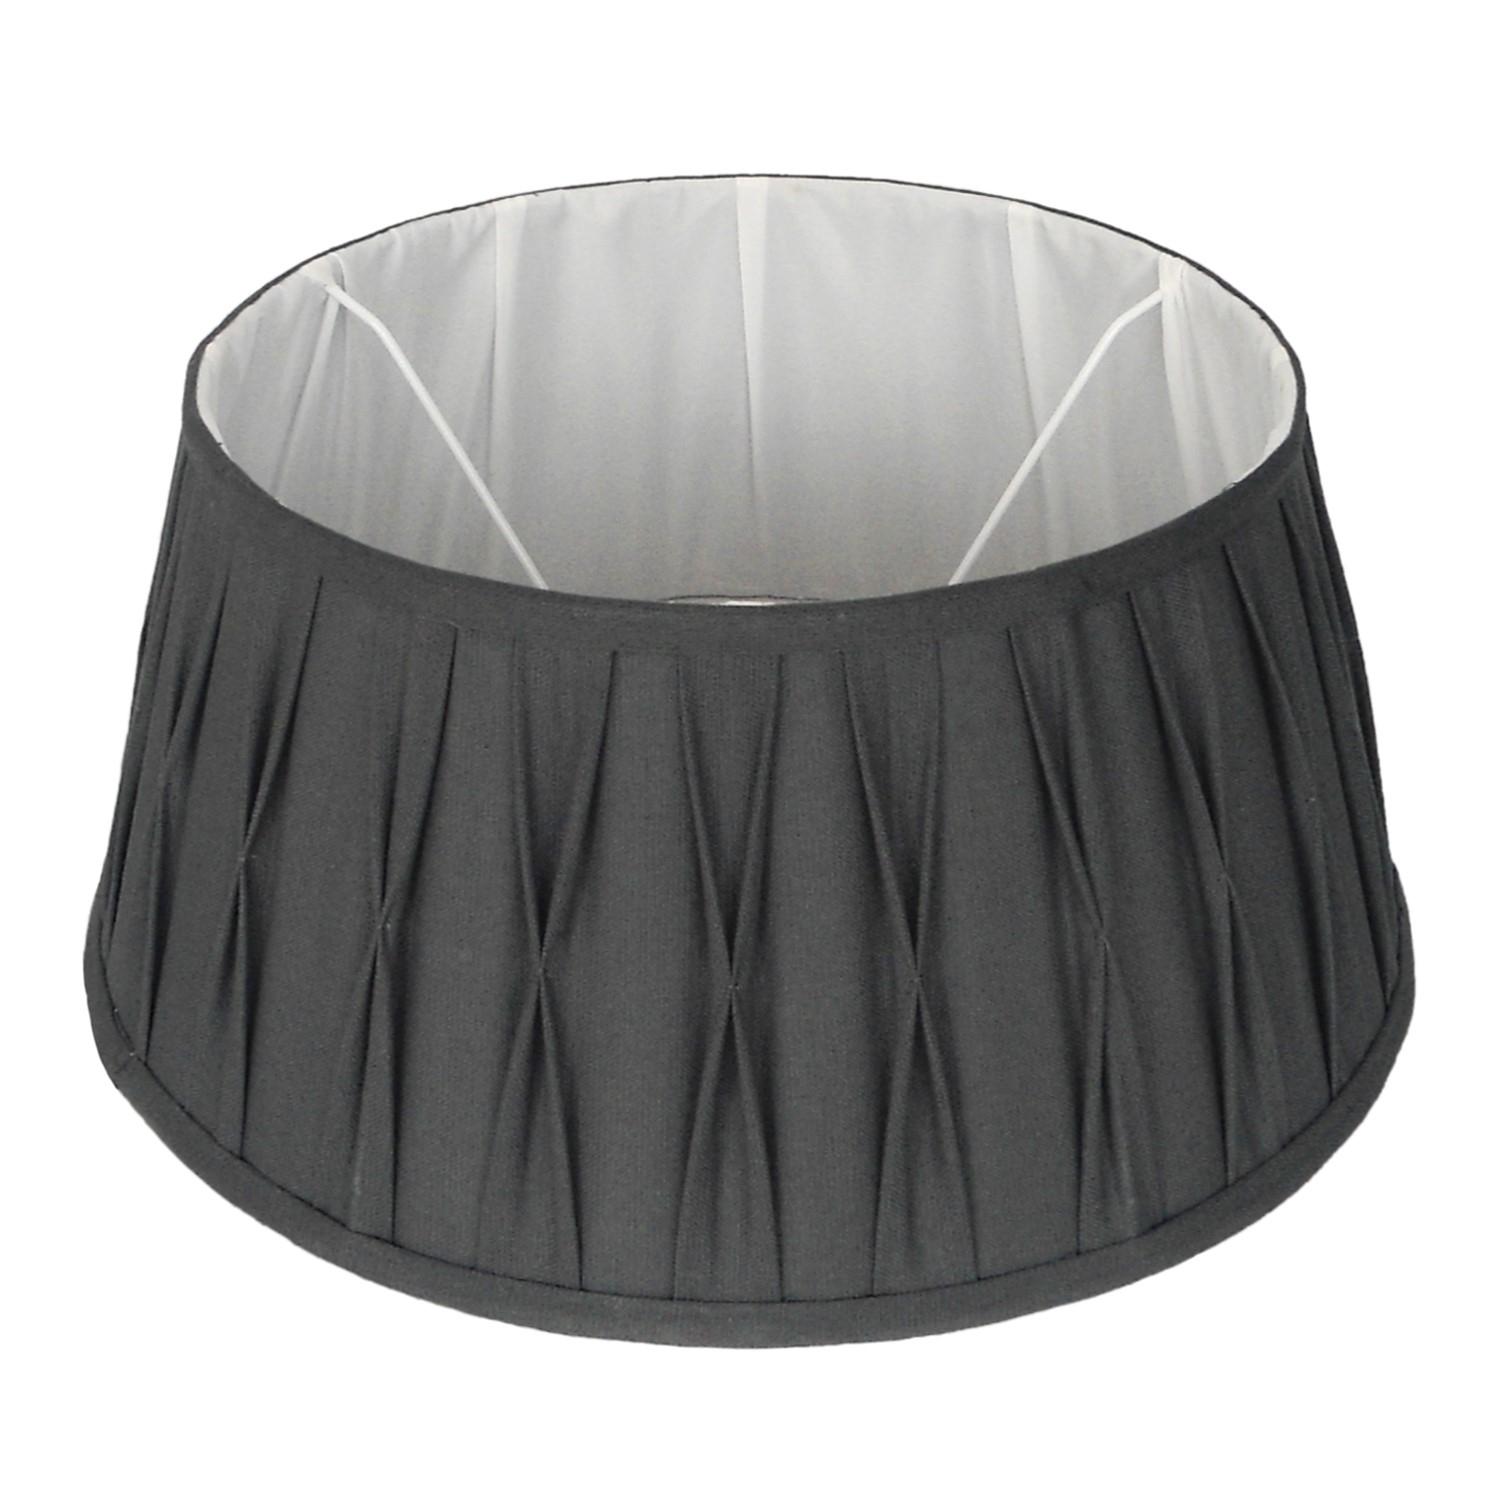 Staande lampenkap plisse Riva drum 20 cm grijs